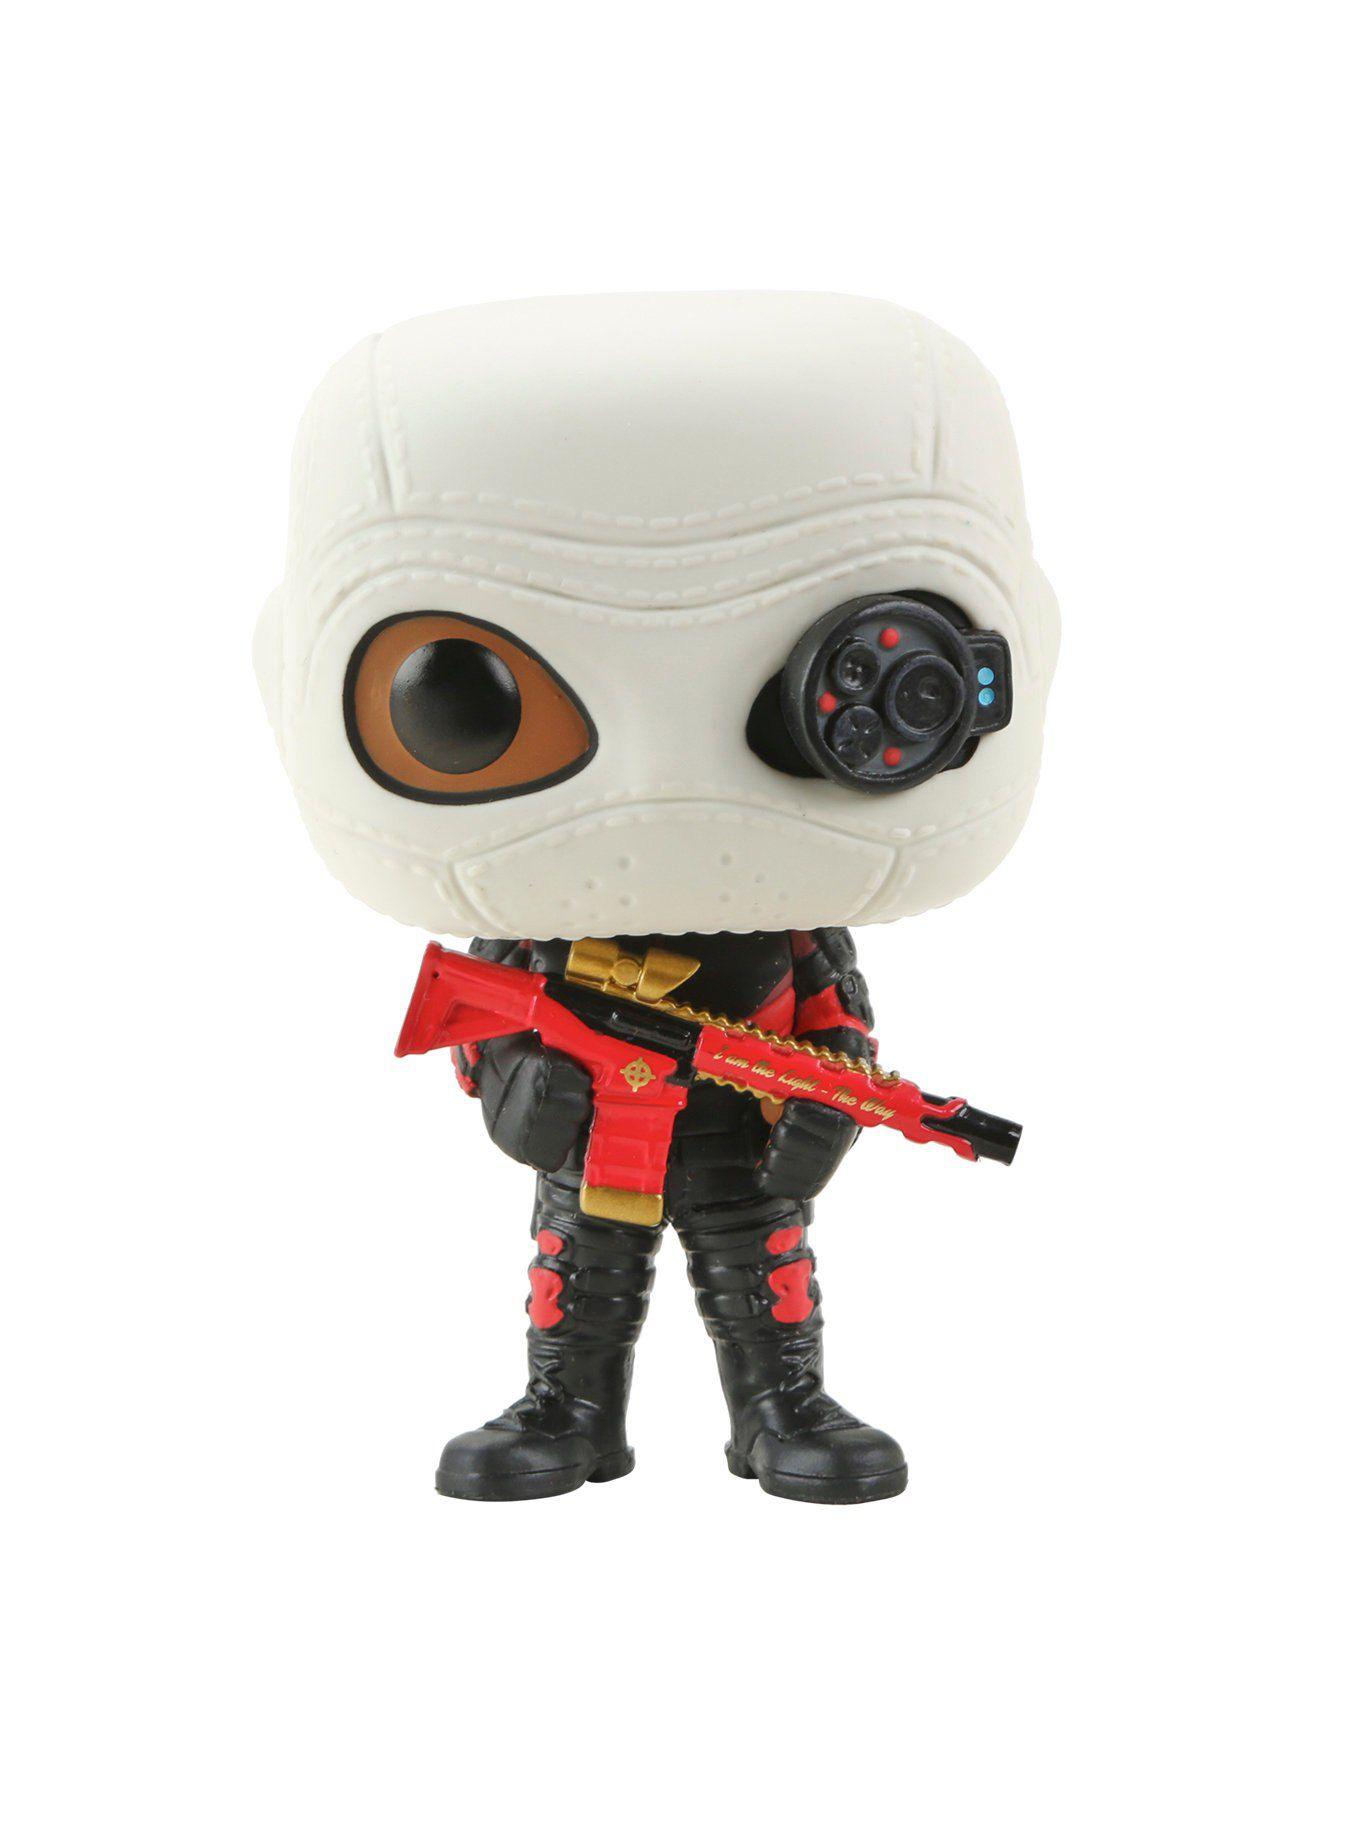 Deadshot #106 ( Pistoleiro ) - Suicide Squad ( Esquadrão Suicida ) - Funko Pop! Heroes